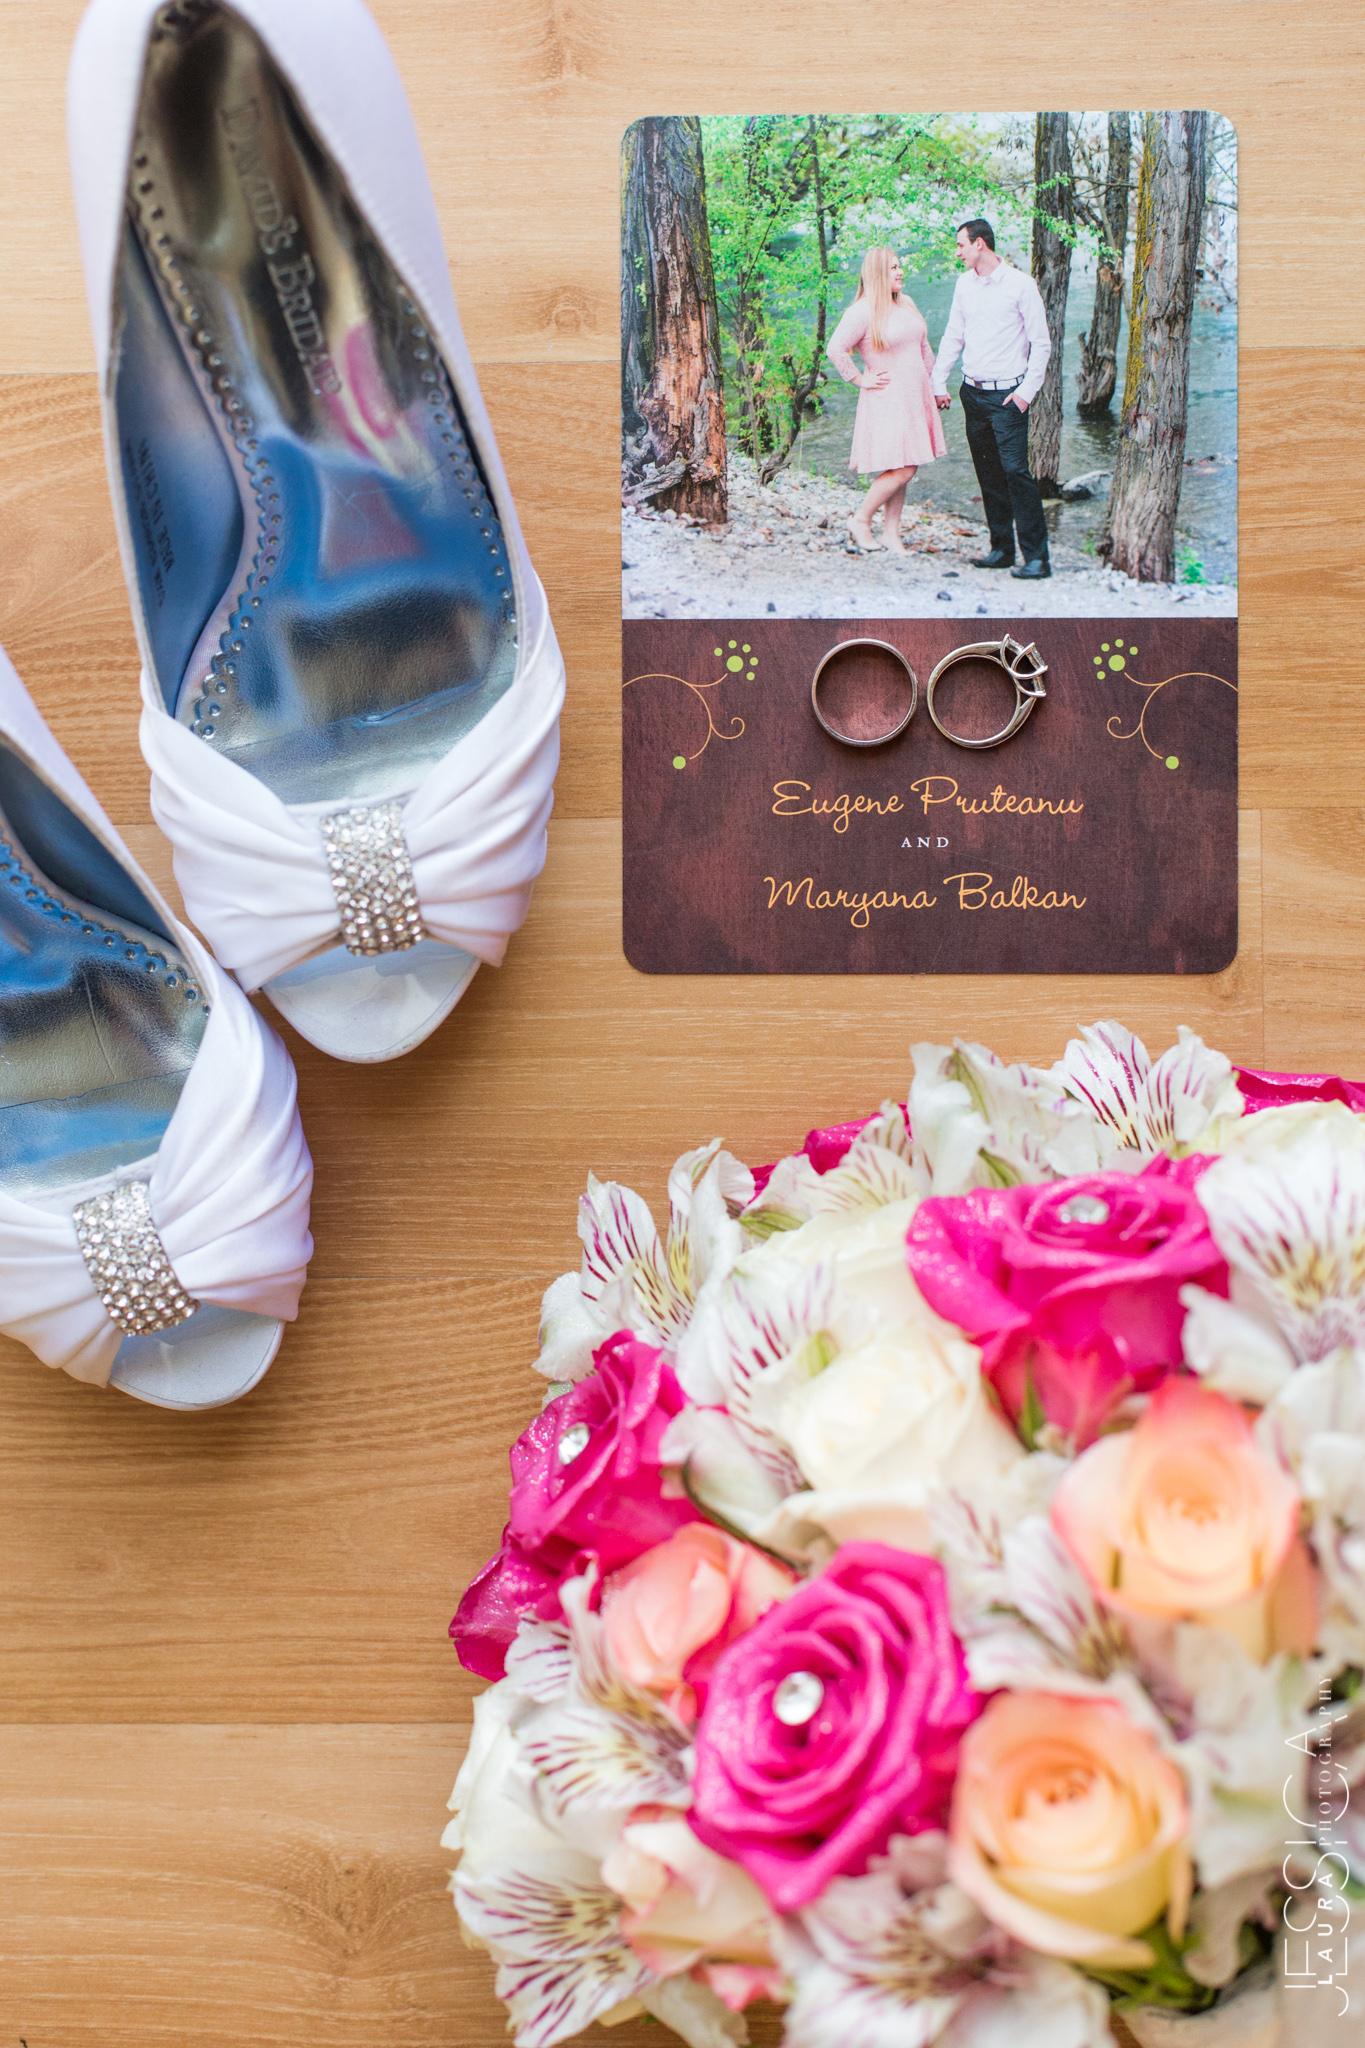 Eugene-Maryana_wedding_08062017_web (8 of 558).JPG